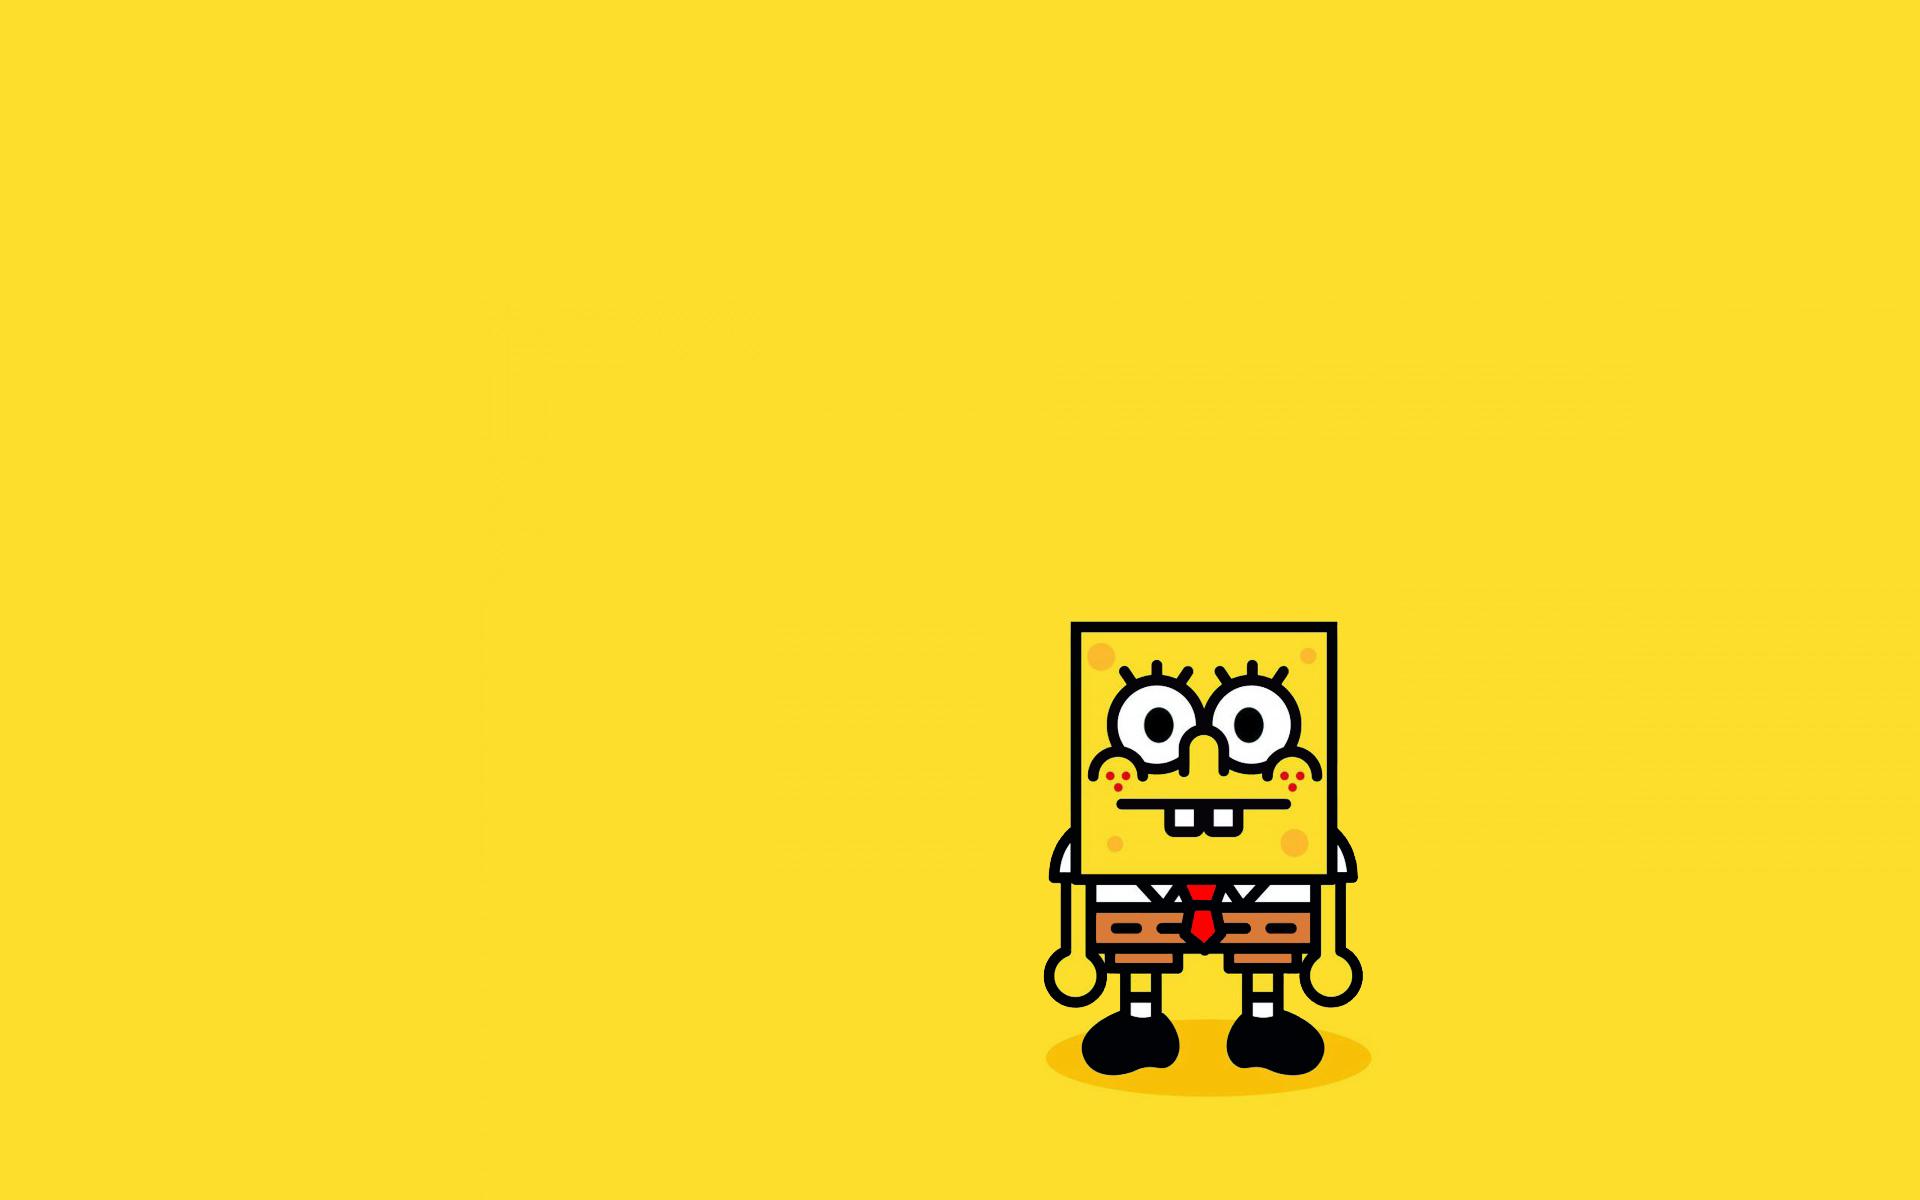 Spongebob Minimalism